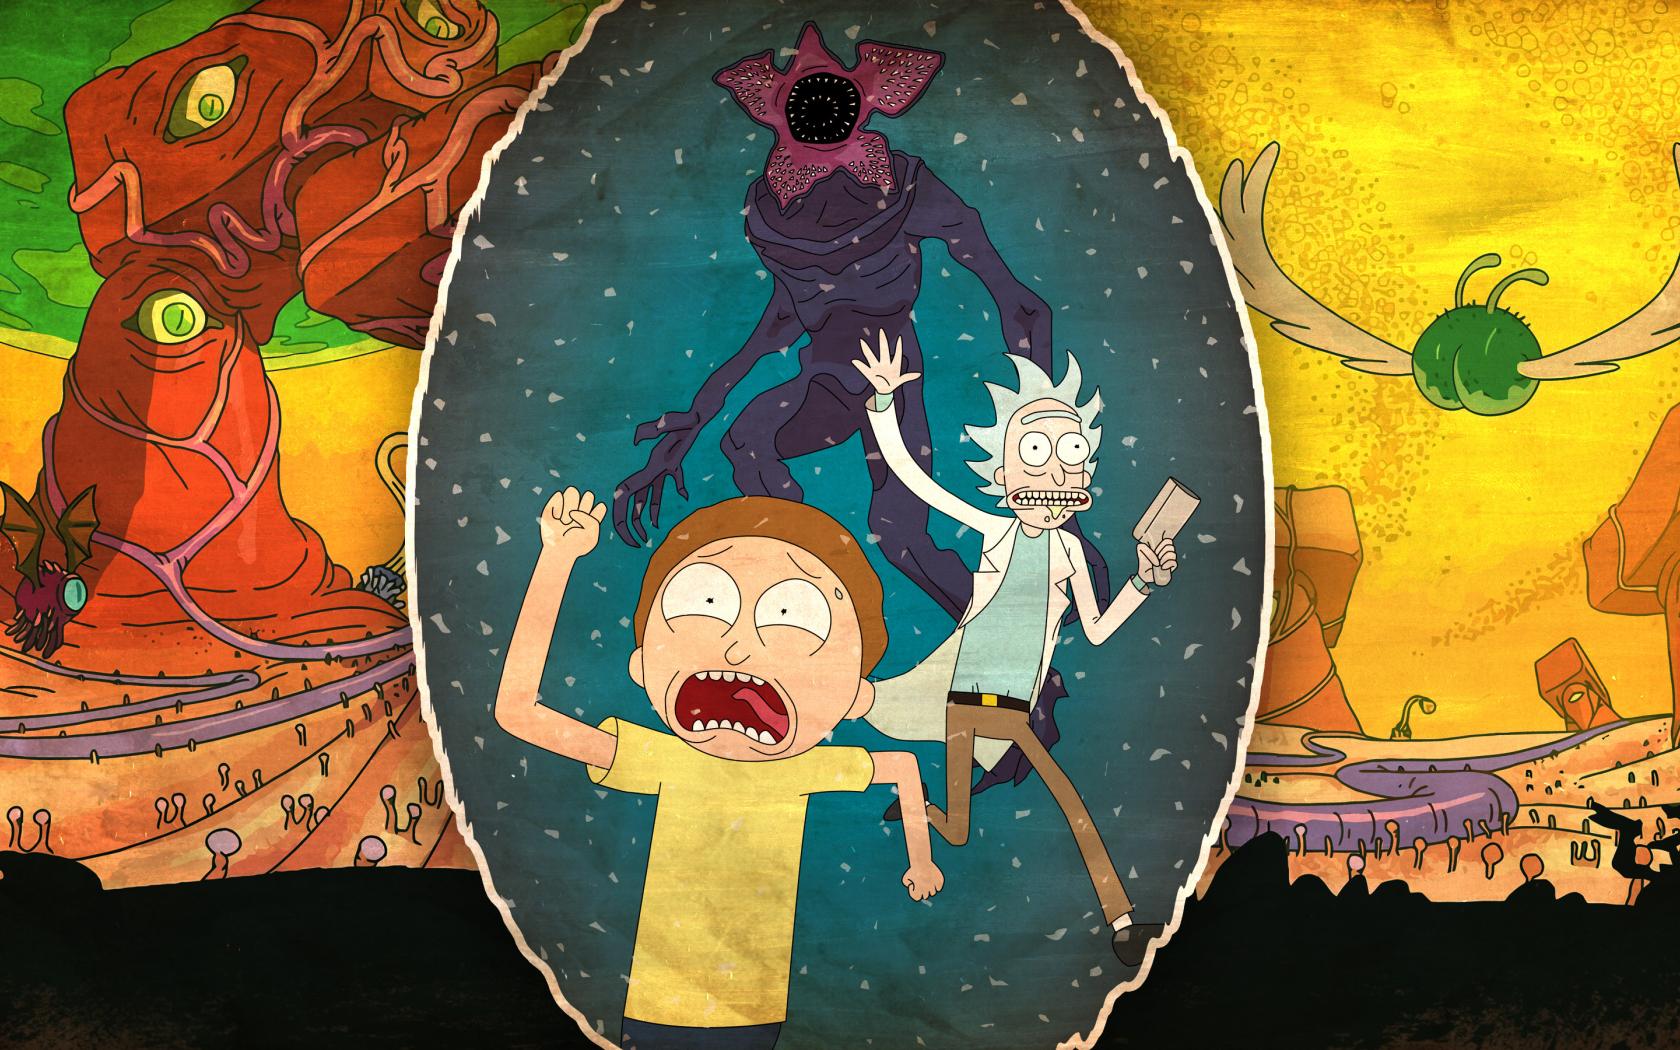 Rick And Morty 2017, HD 4K Wallpaper